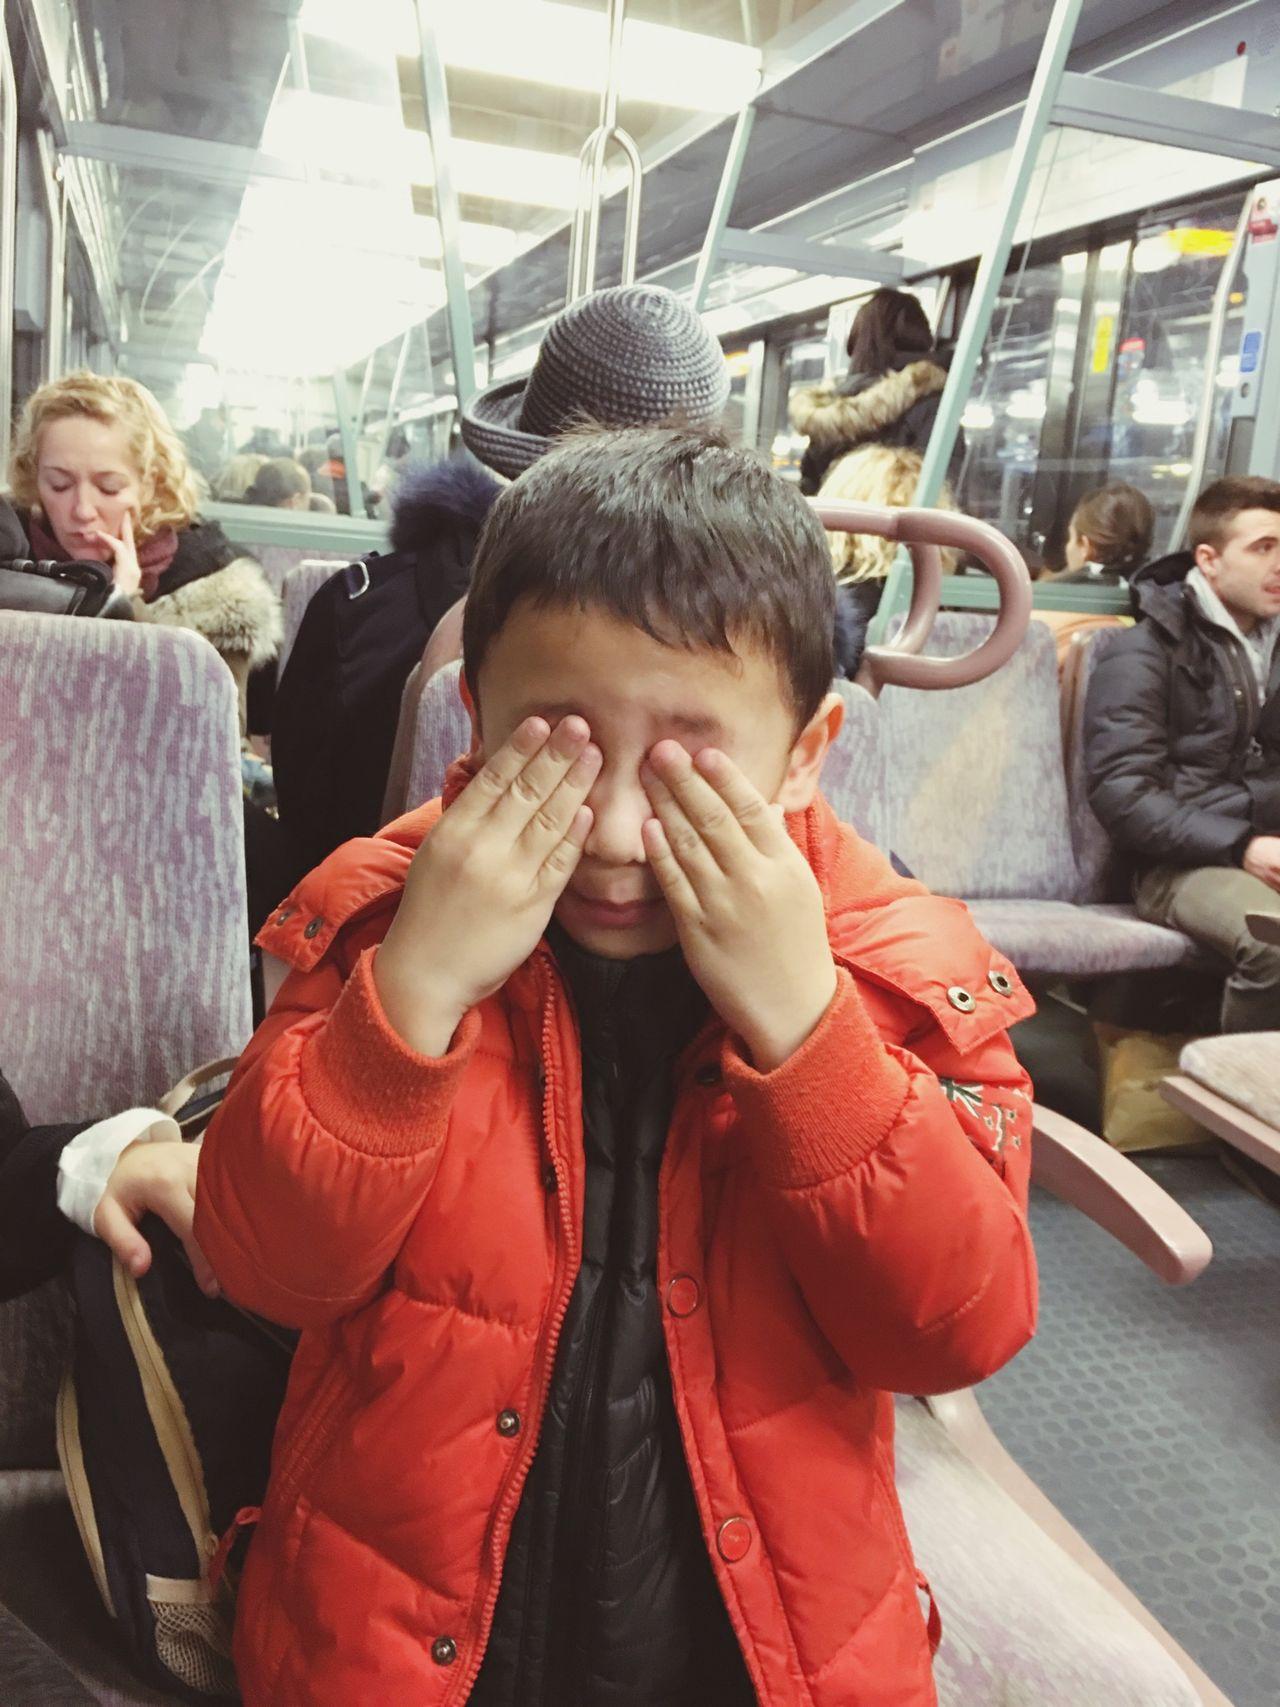 Inside The Metro Boy Hiding Eyes Boy Closing Eyes